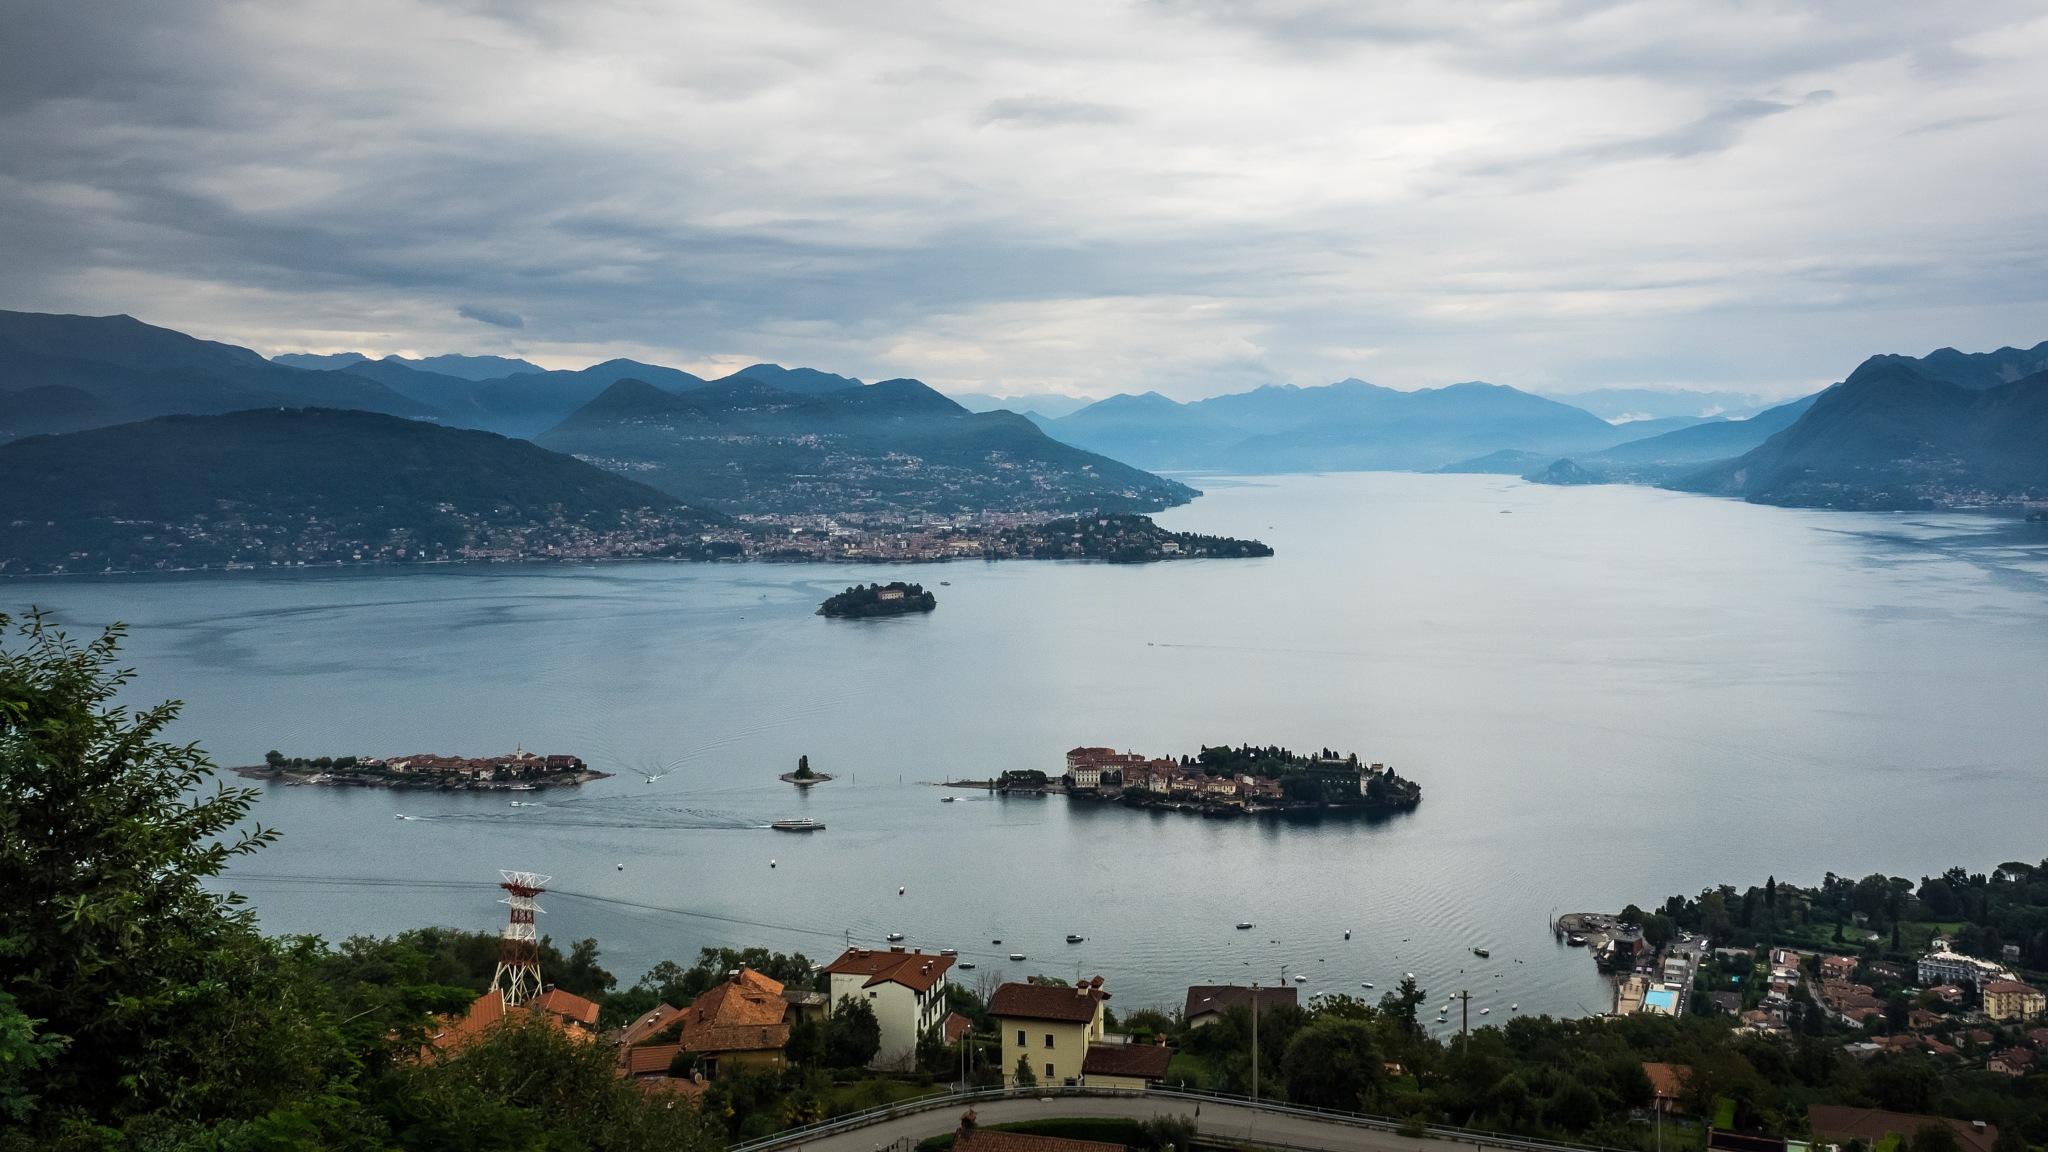 Lago Maggiore by Werner Hofmann